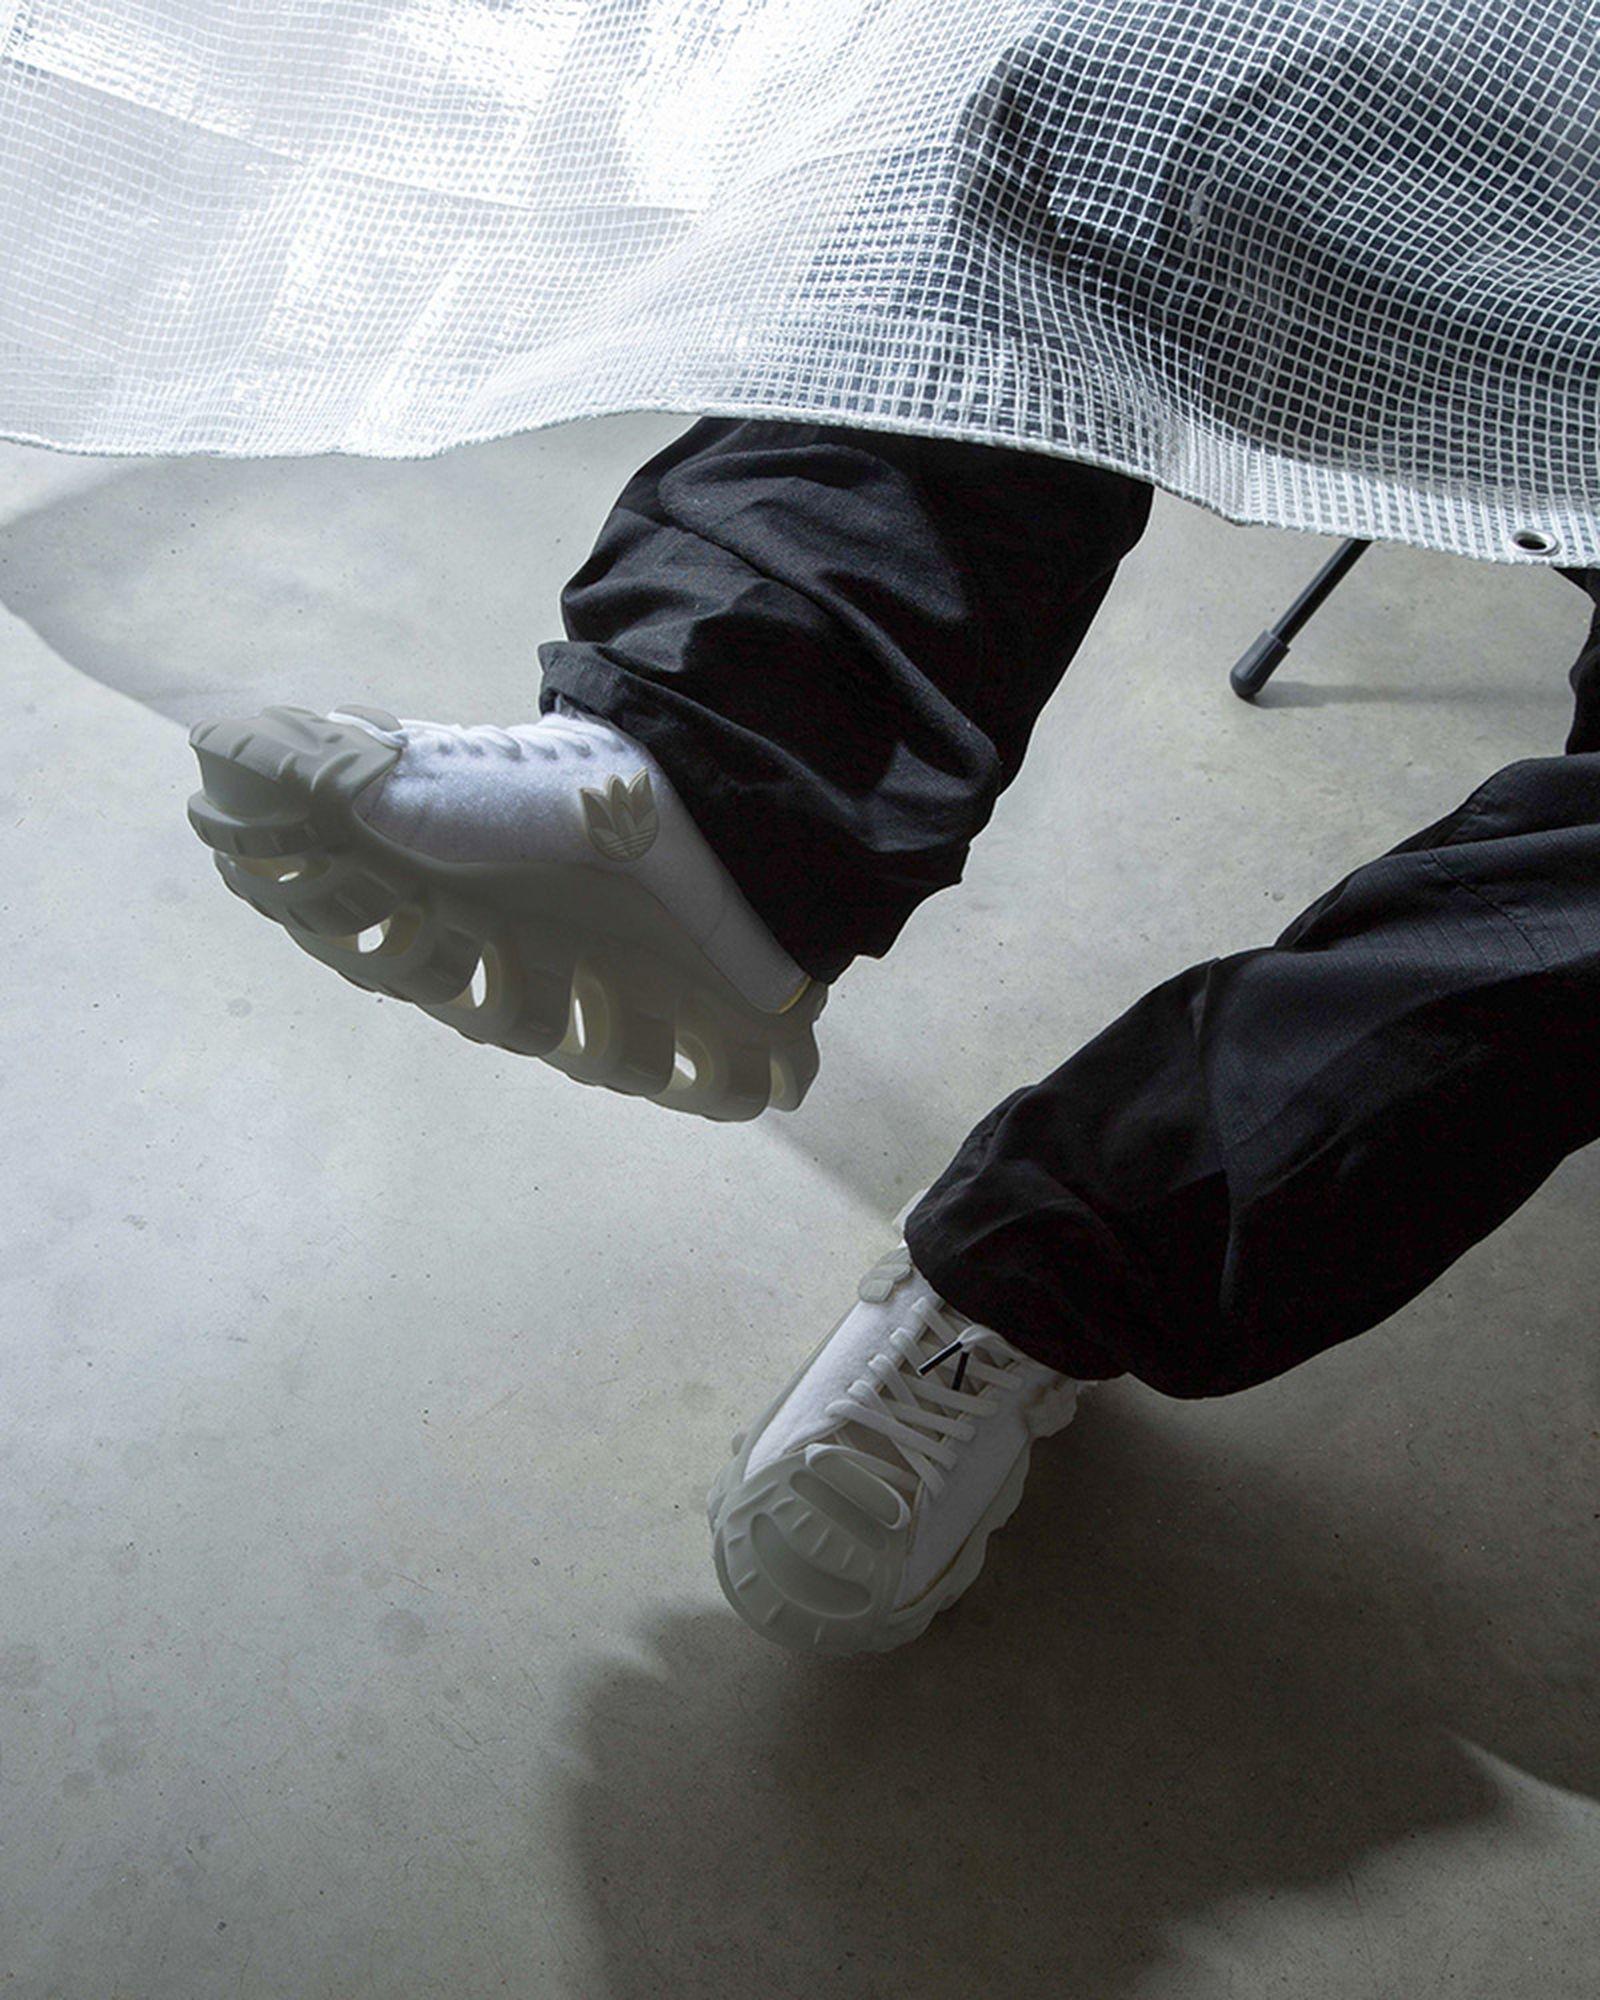 mr-bailey-ammonite-adidas-superstar-05